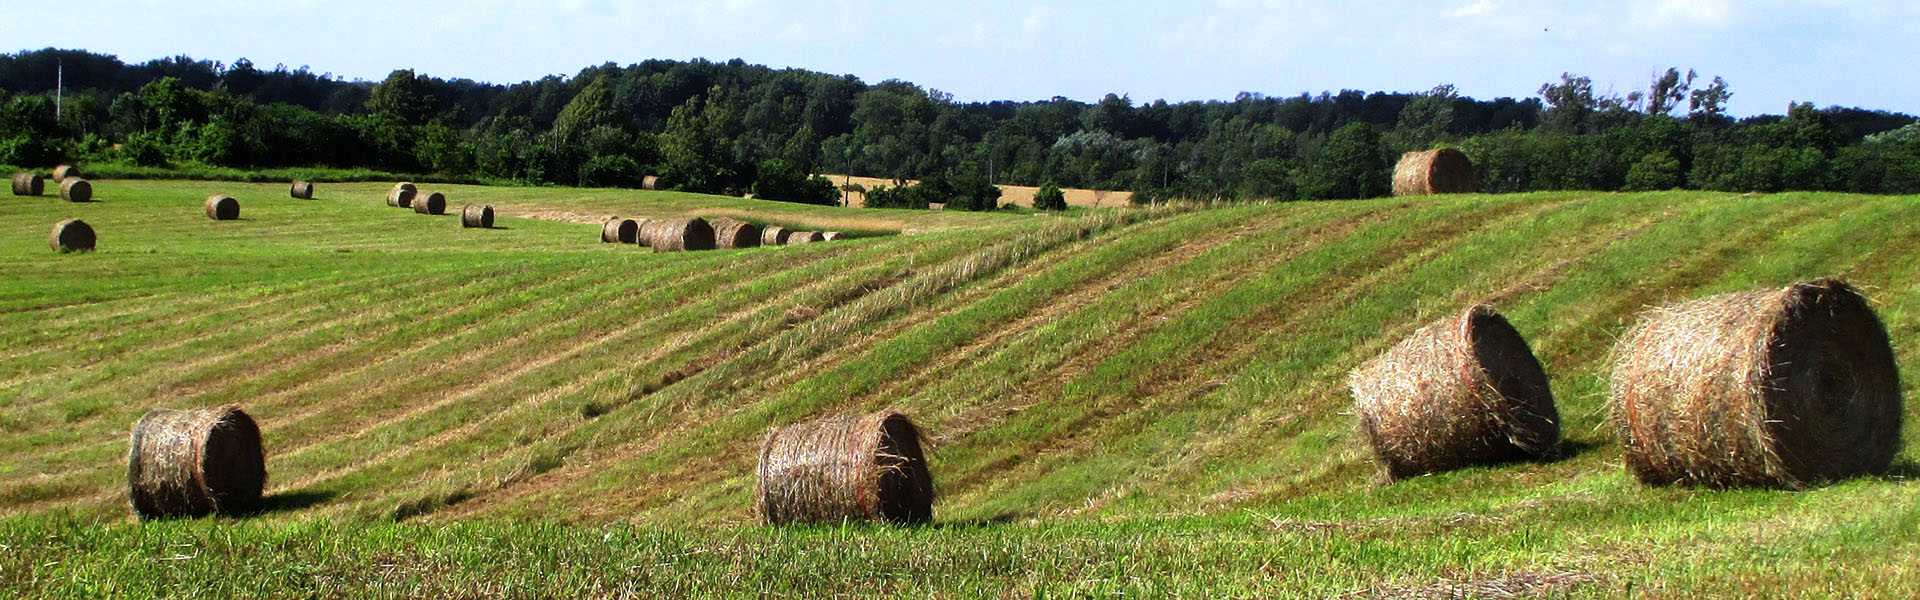 Scotsdale Farm, Halton Hills